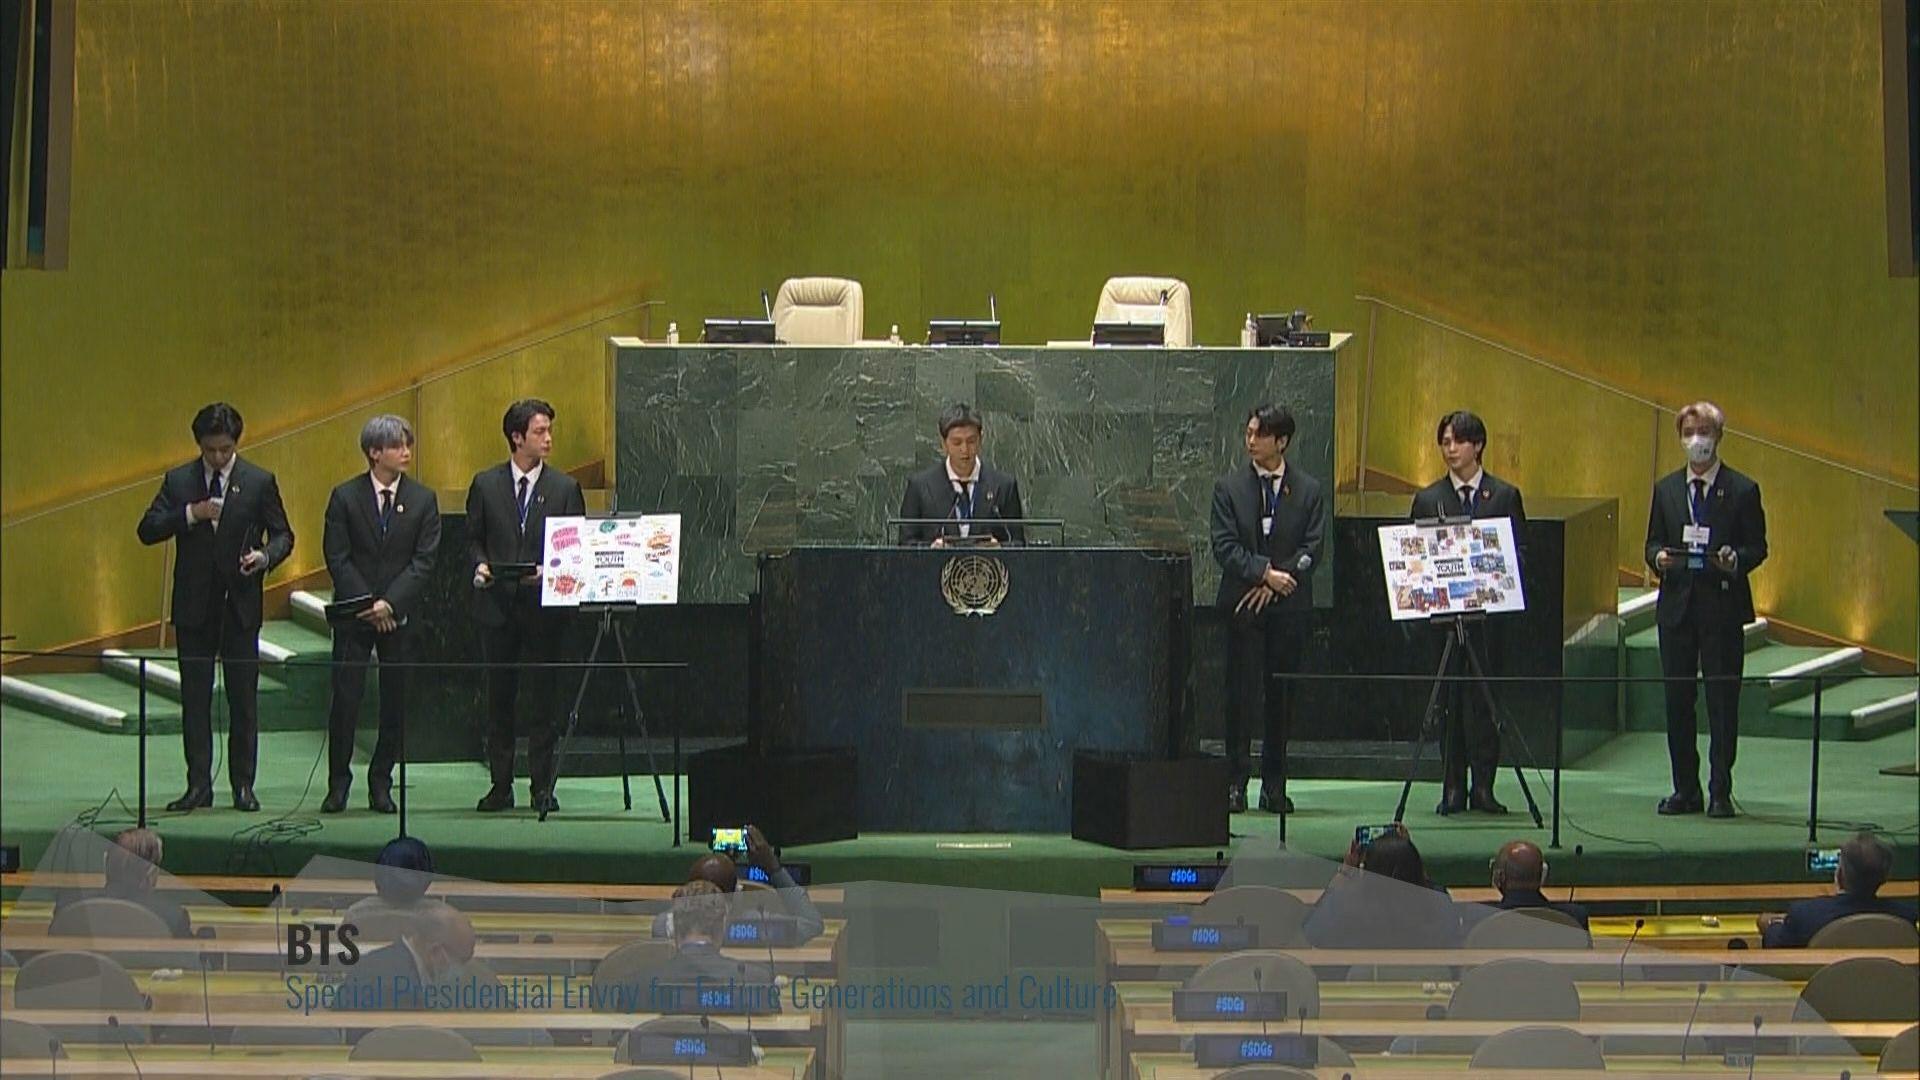 UN 무대에 선 문 대통령과 BTS 풀영상…희망을 이야기하다